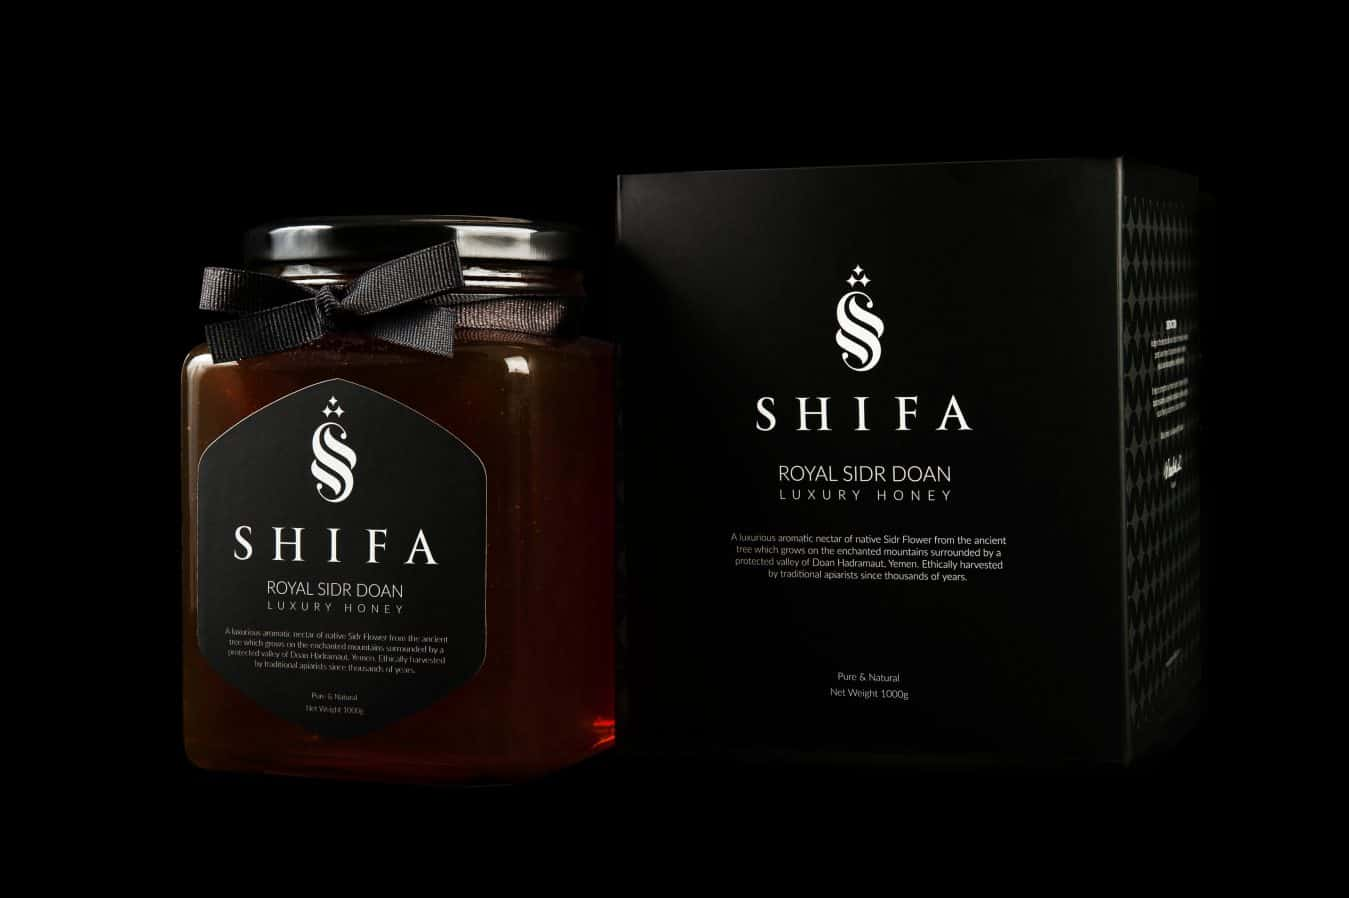 Shifa Royal Sidr Doan Honey - 4